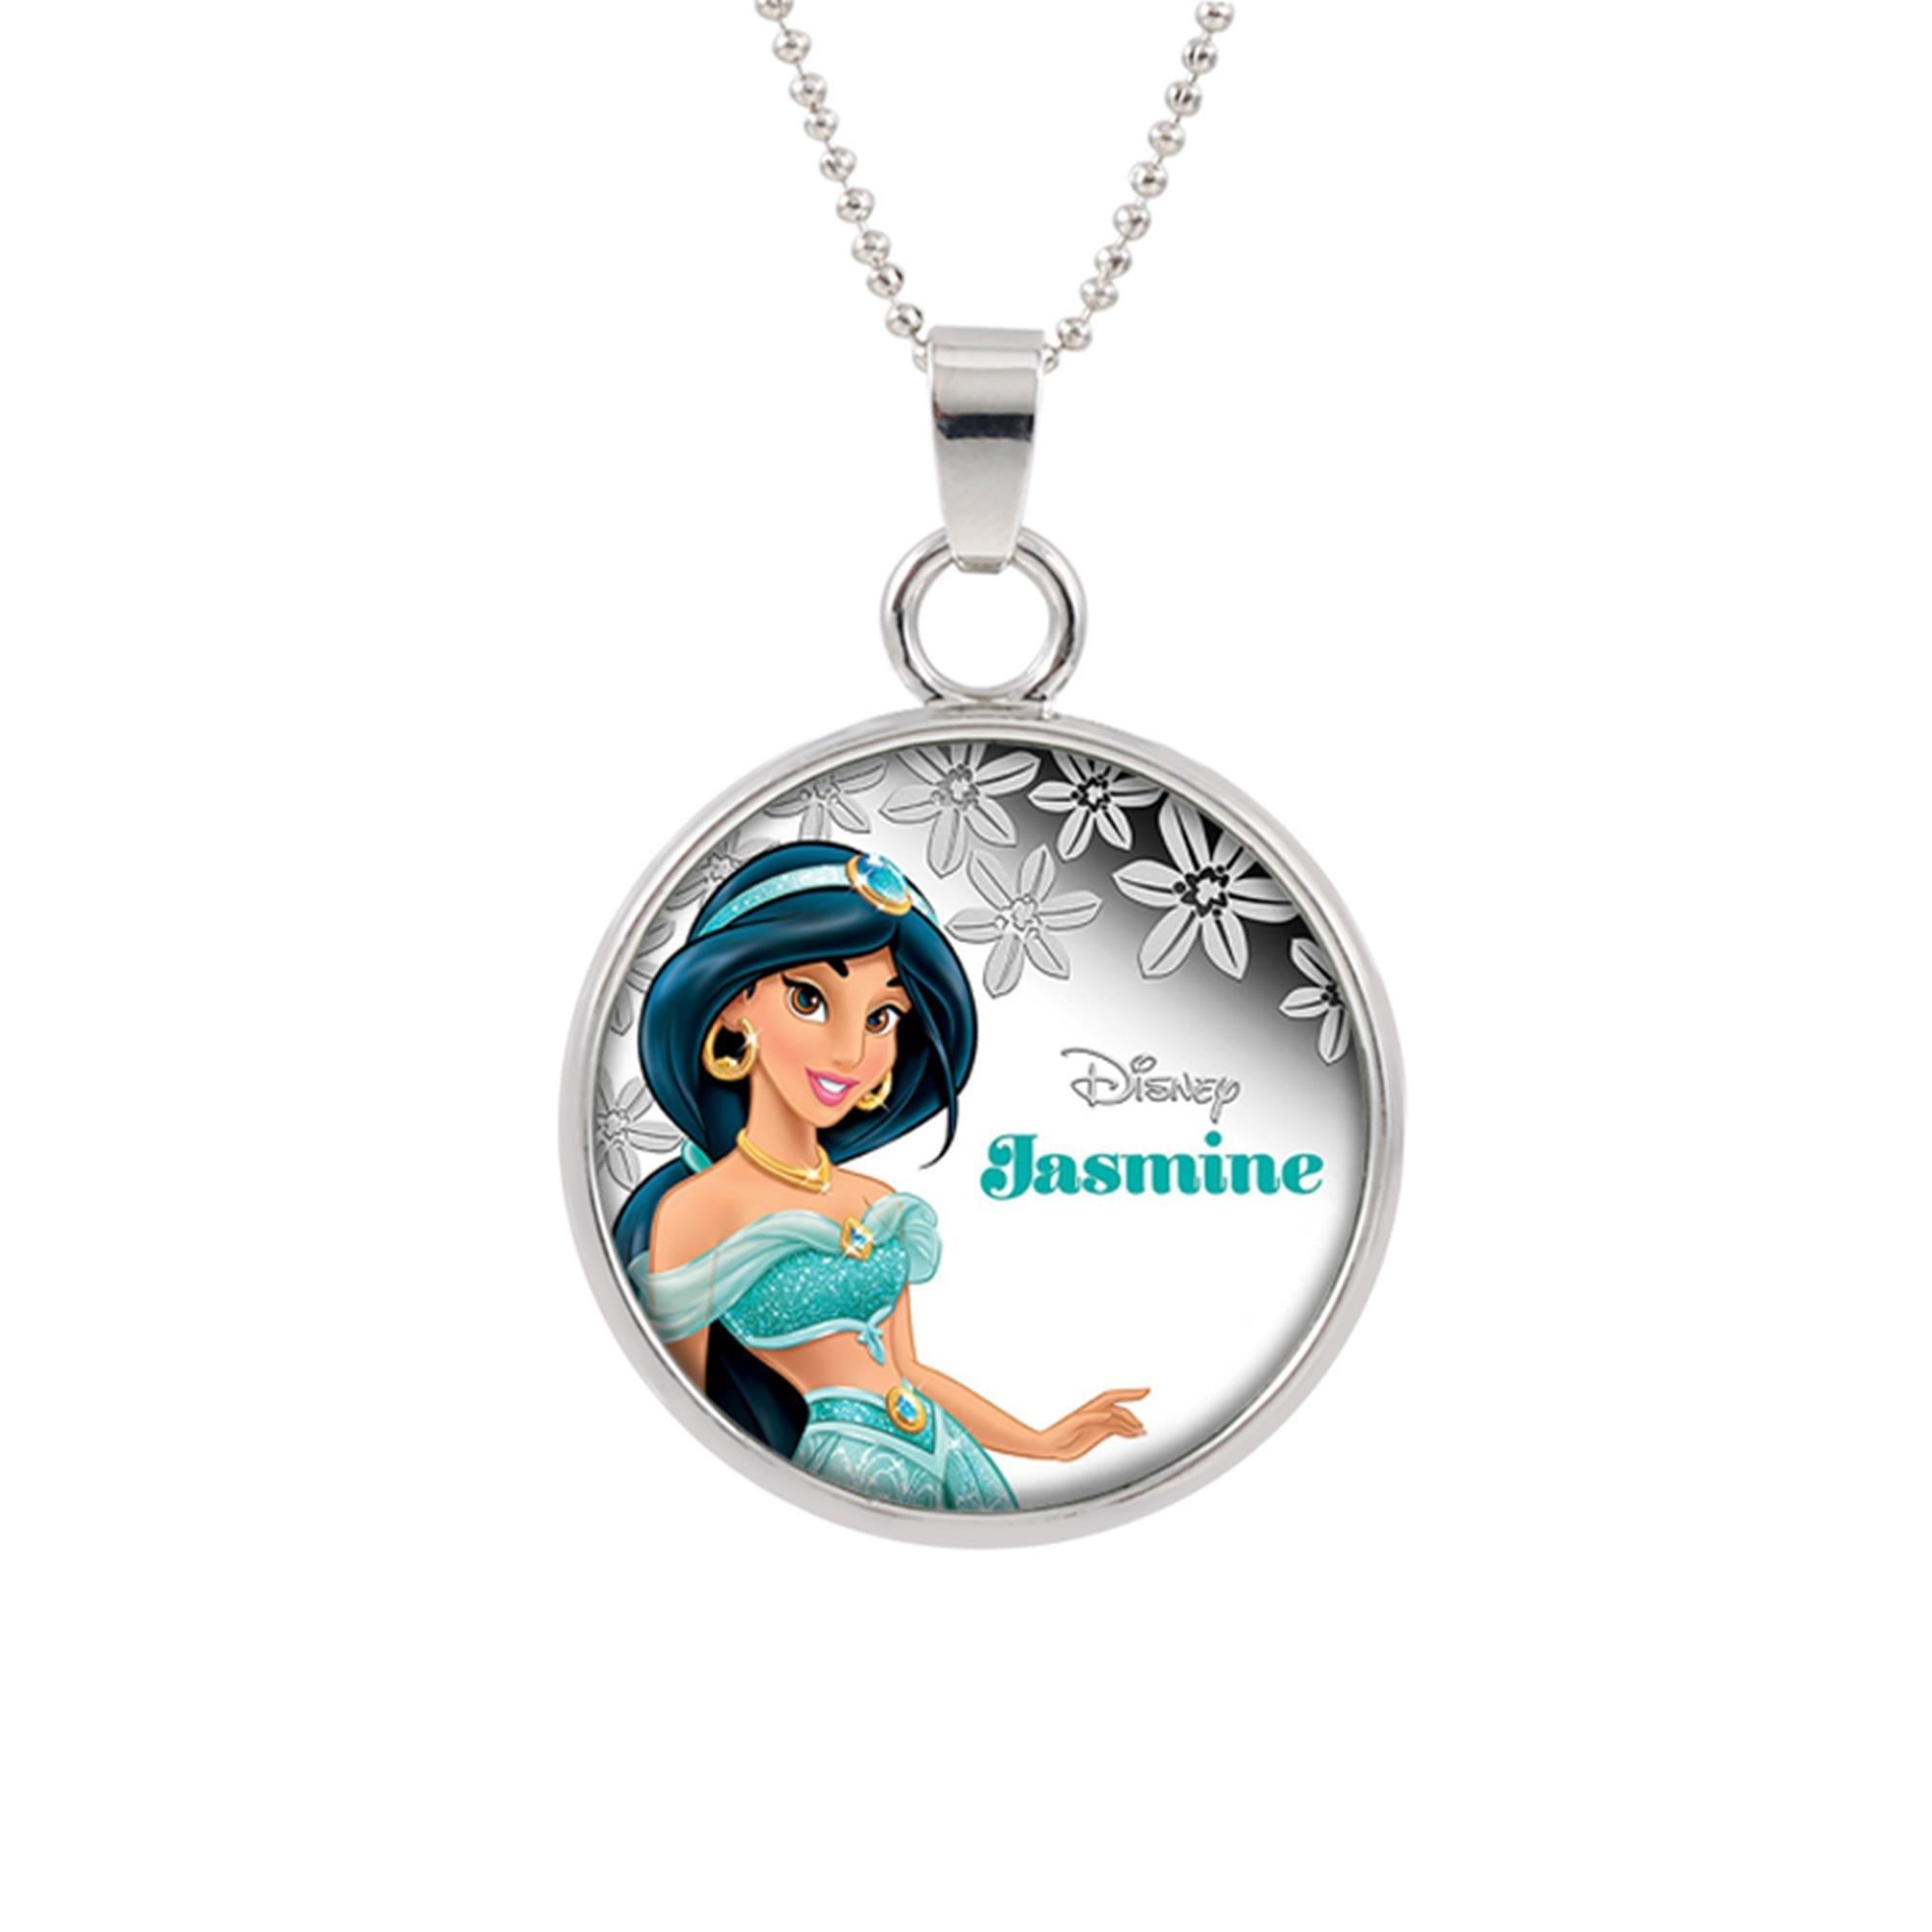 Aladdin Jasmine Disney Pendant Necklace TV Movies Classic Cartoons Superhero Logo Theme Princess Premium Quality Detailed Cosplay Jewelry Gift Series